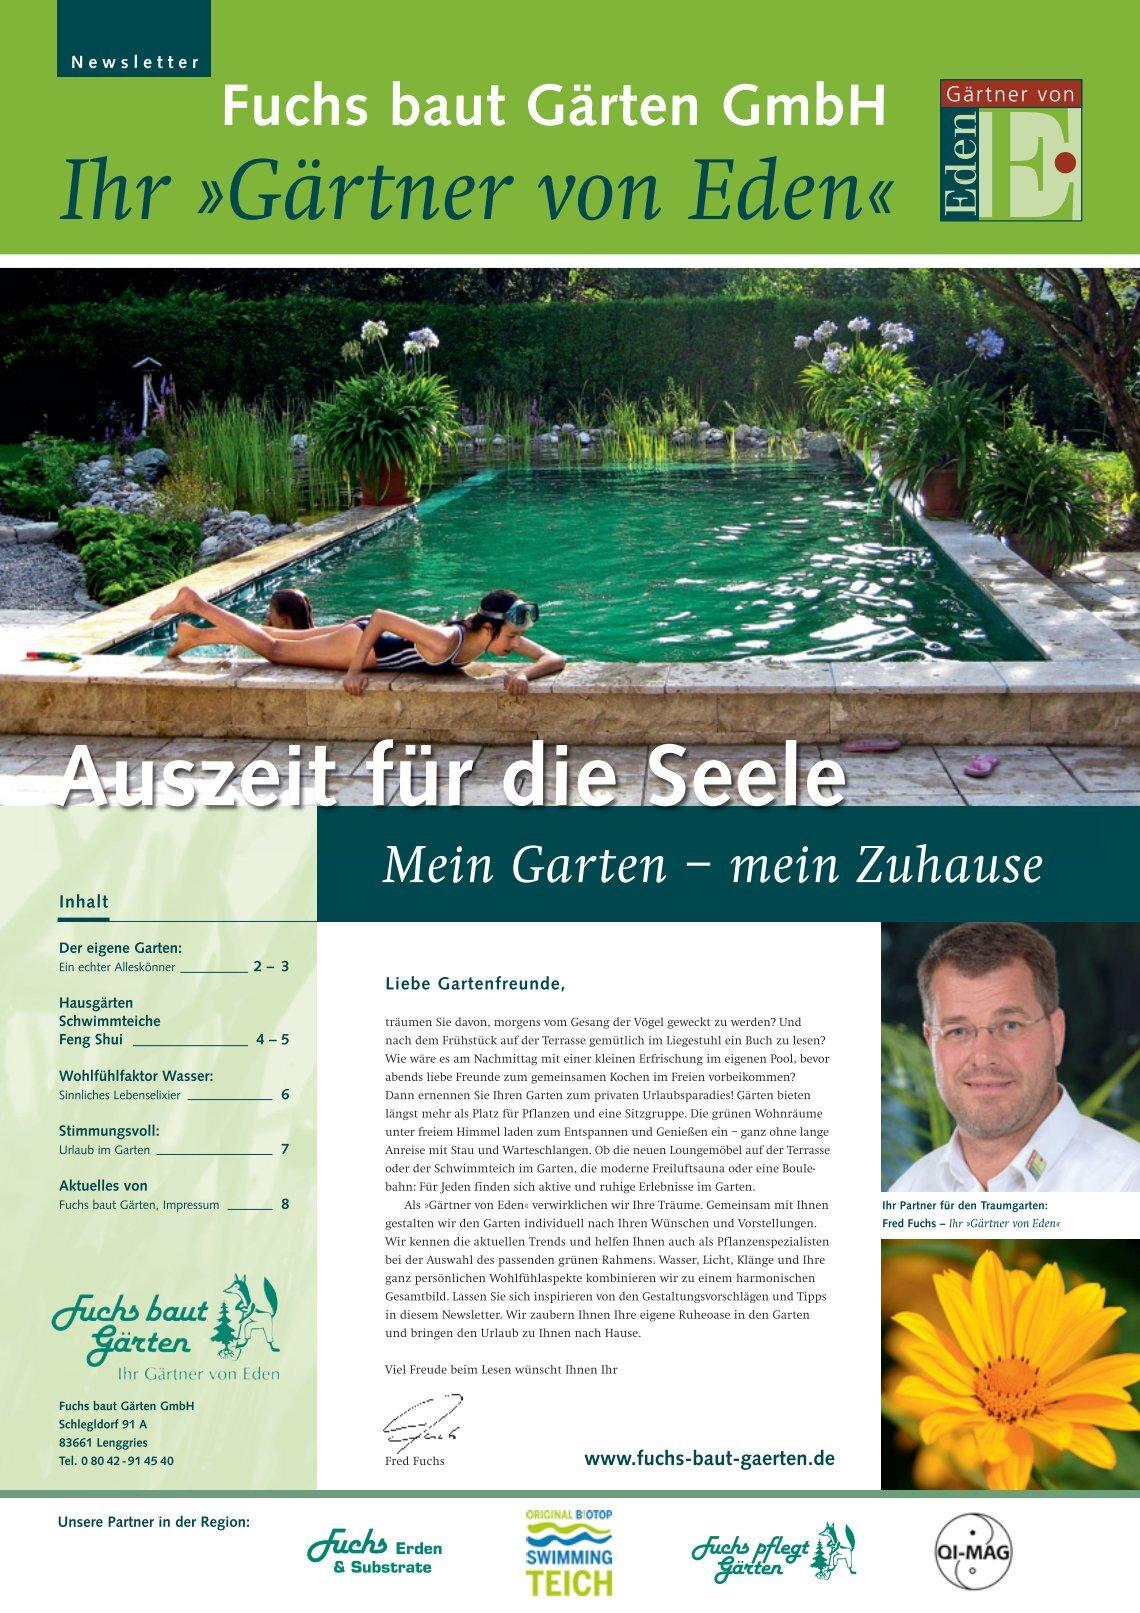 Fuchs Baut Gärten 2 free magazines from fuchs baut gaerten de